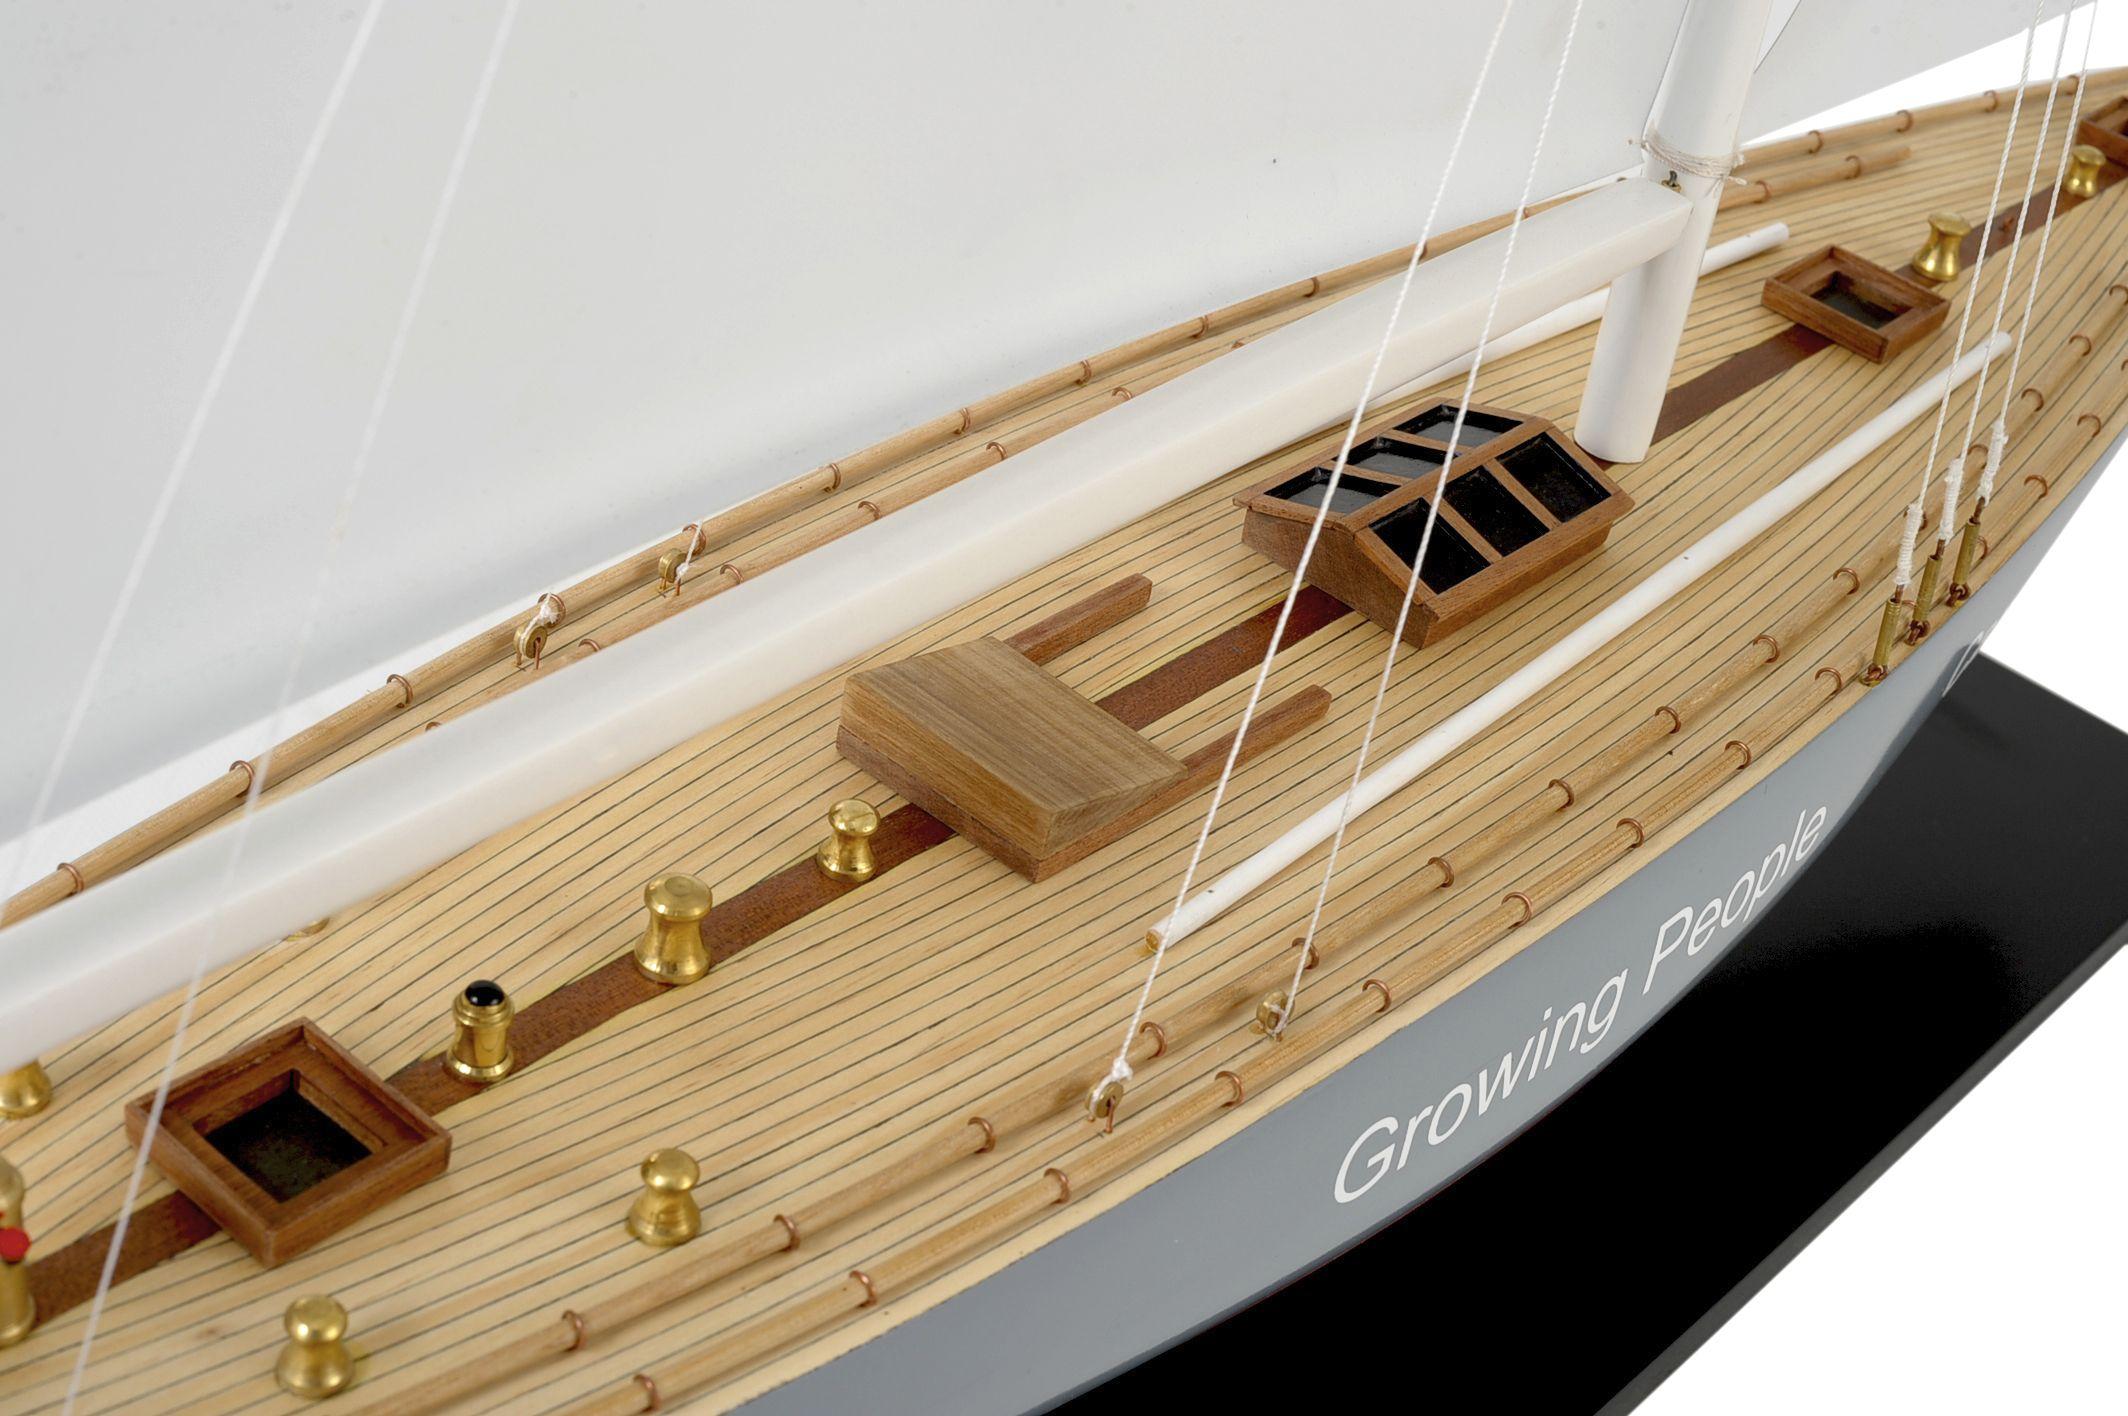 1519-8979-Enterprise-Model-Yacht